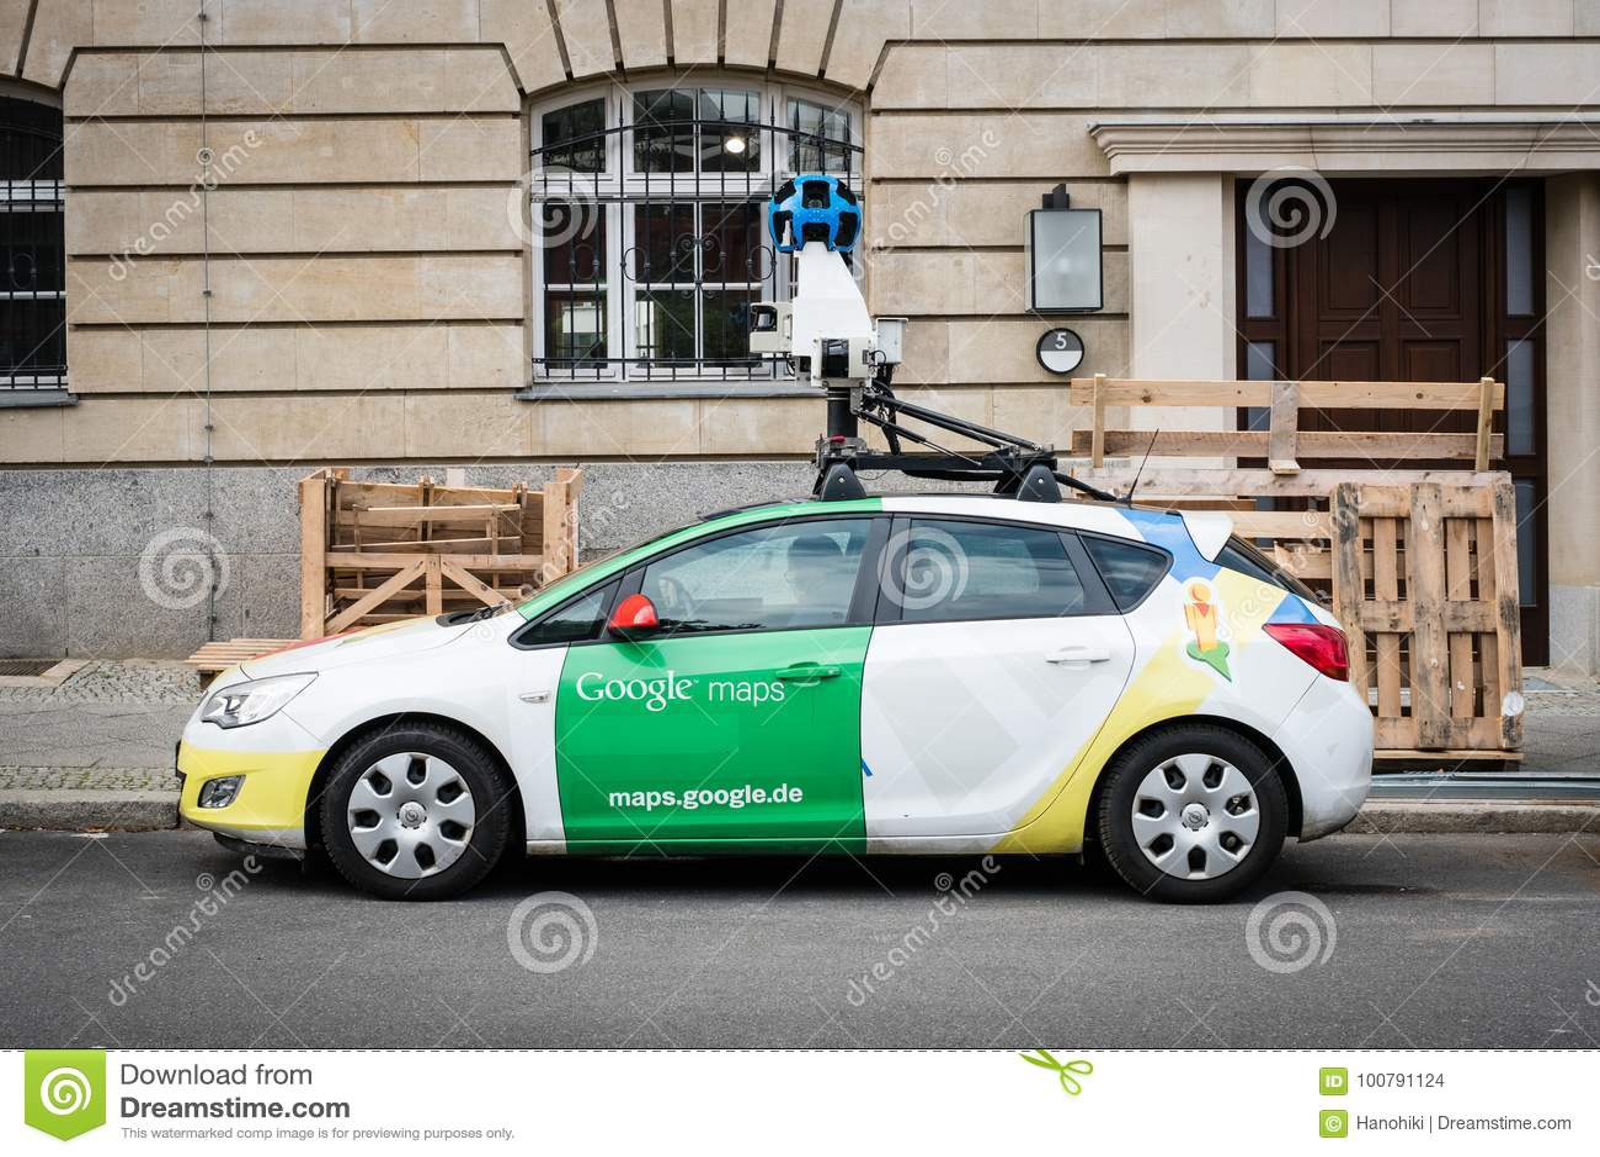 360 google camera